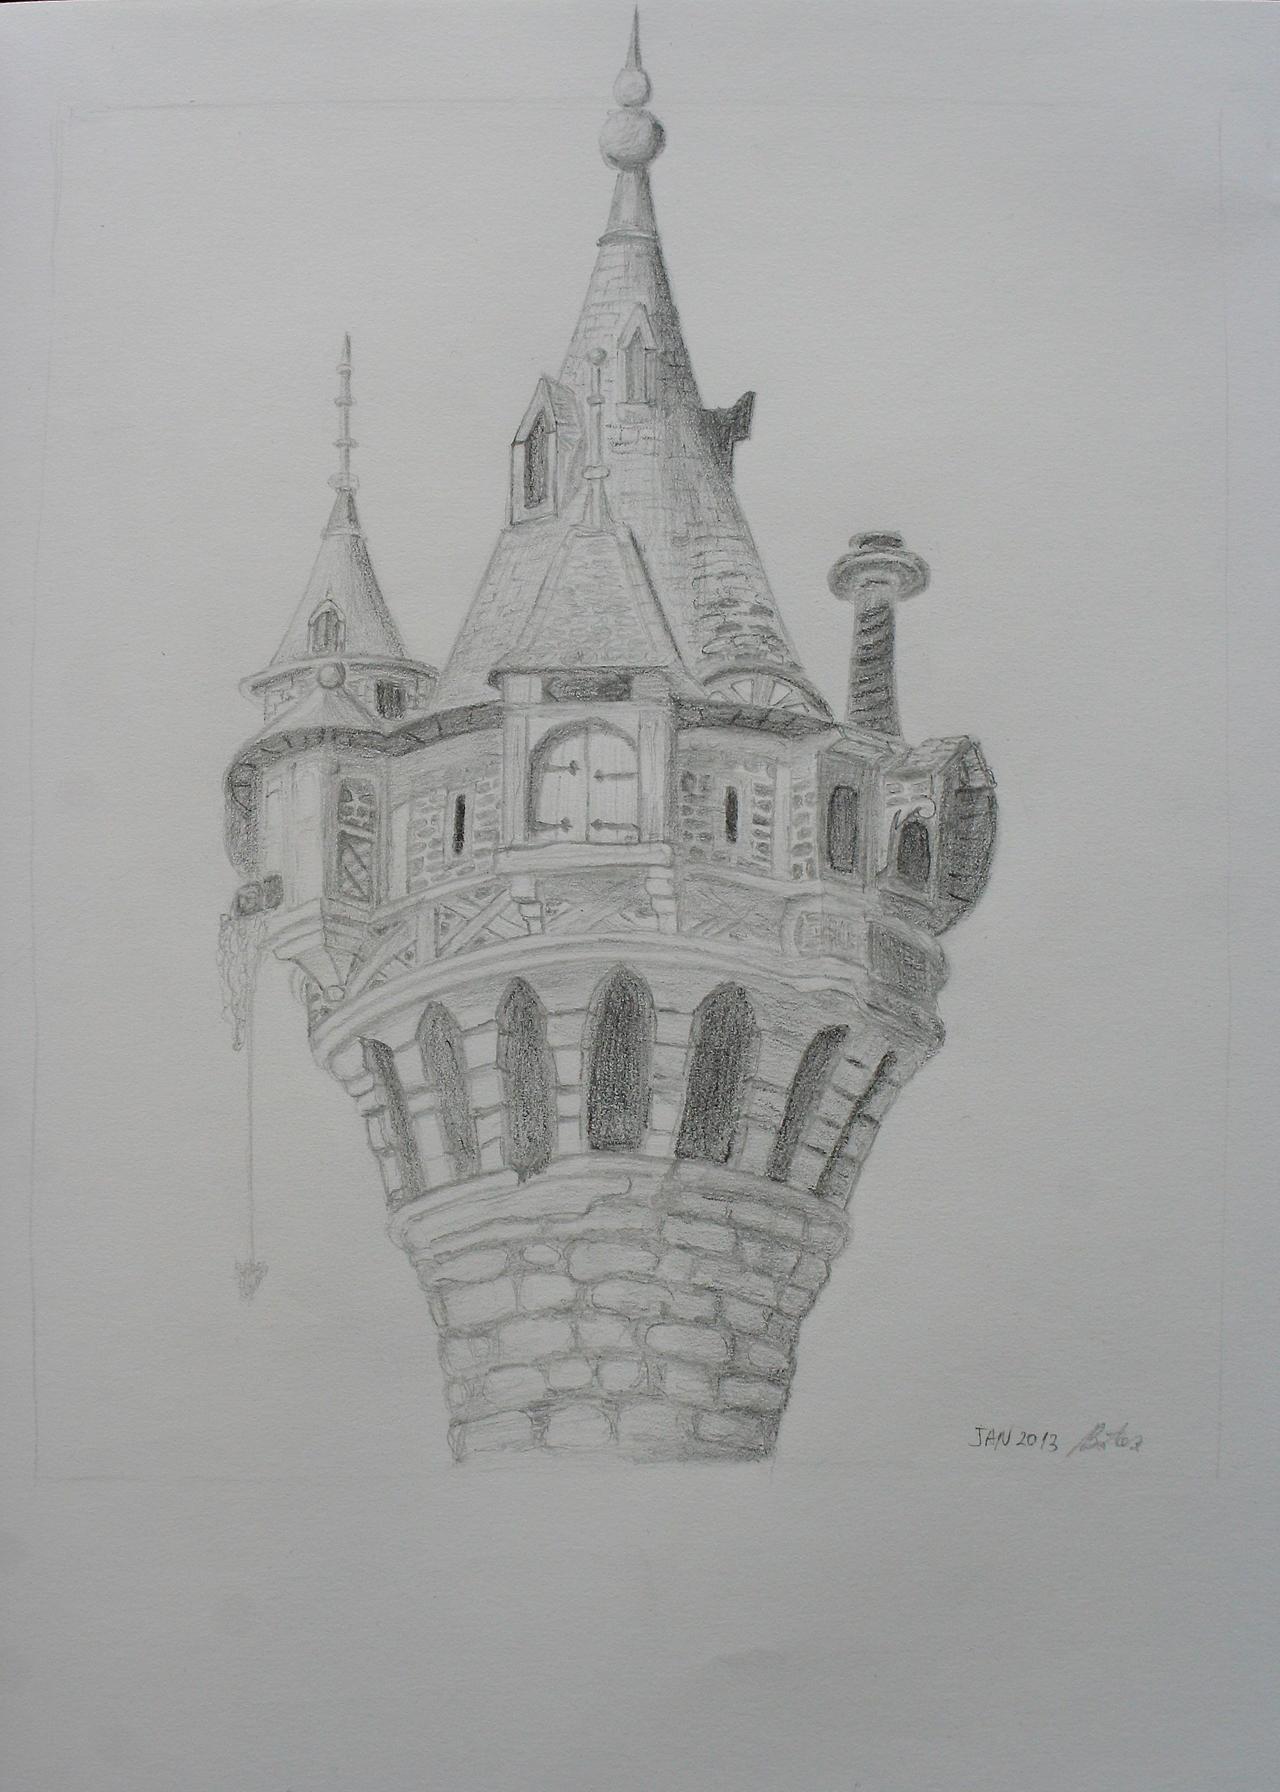 Rapunzel's tower sketch by mirceabotez